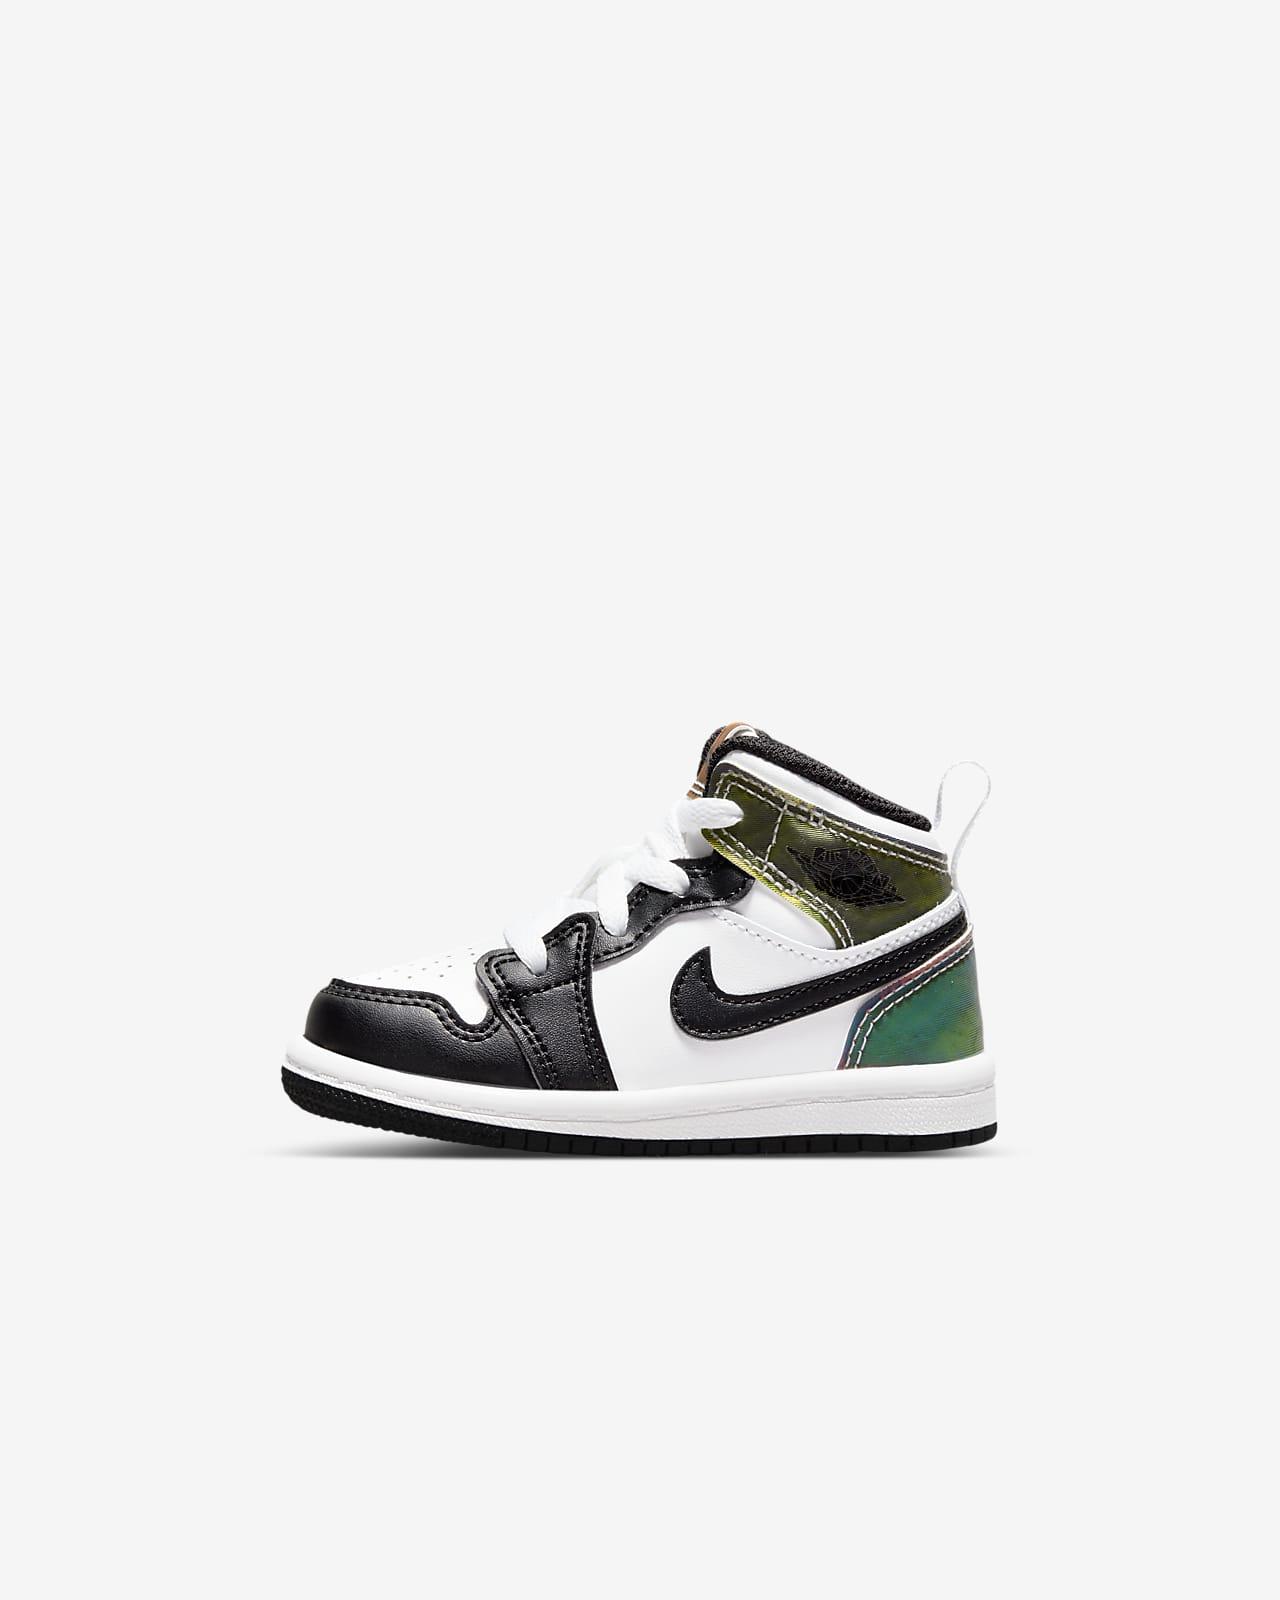 Jordan 1 中筒 SE 嬰幼兒鞋款